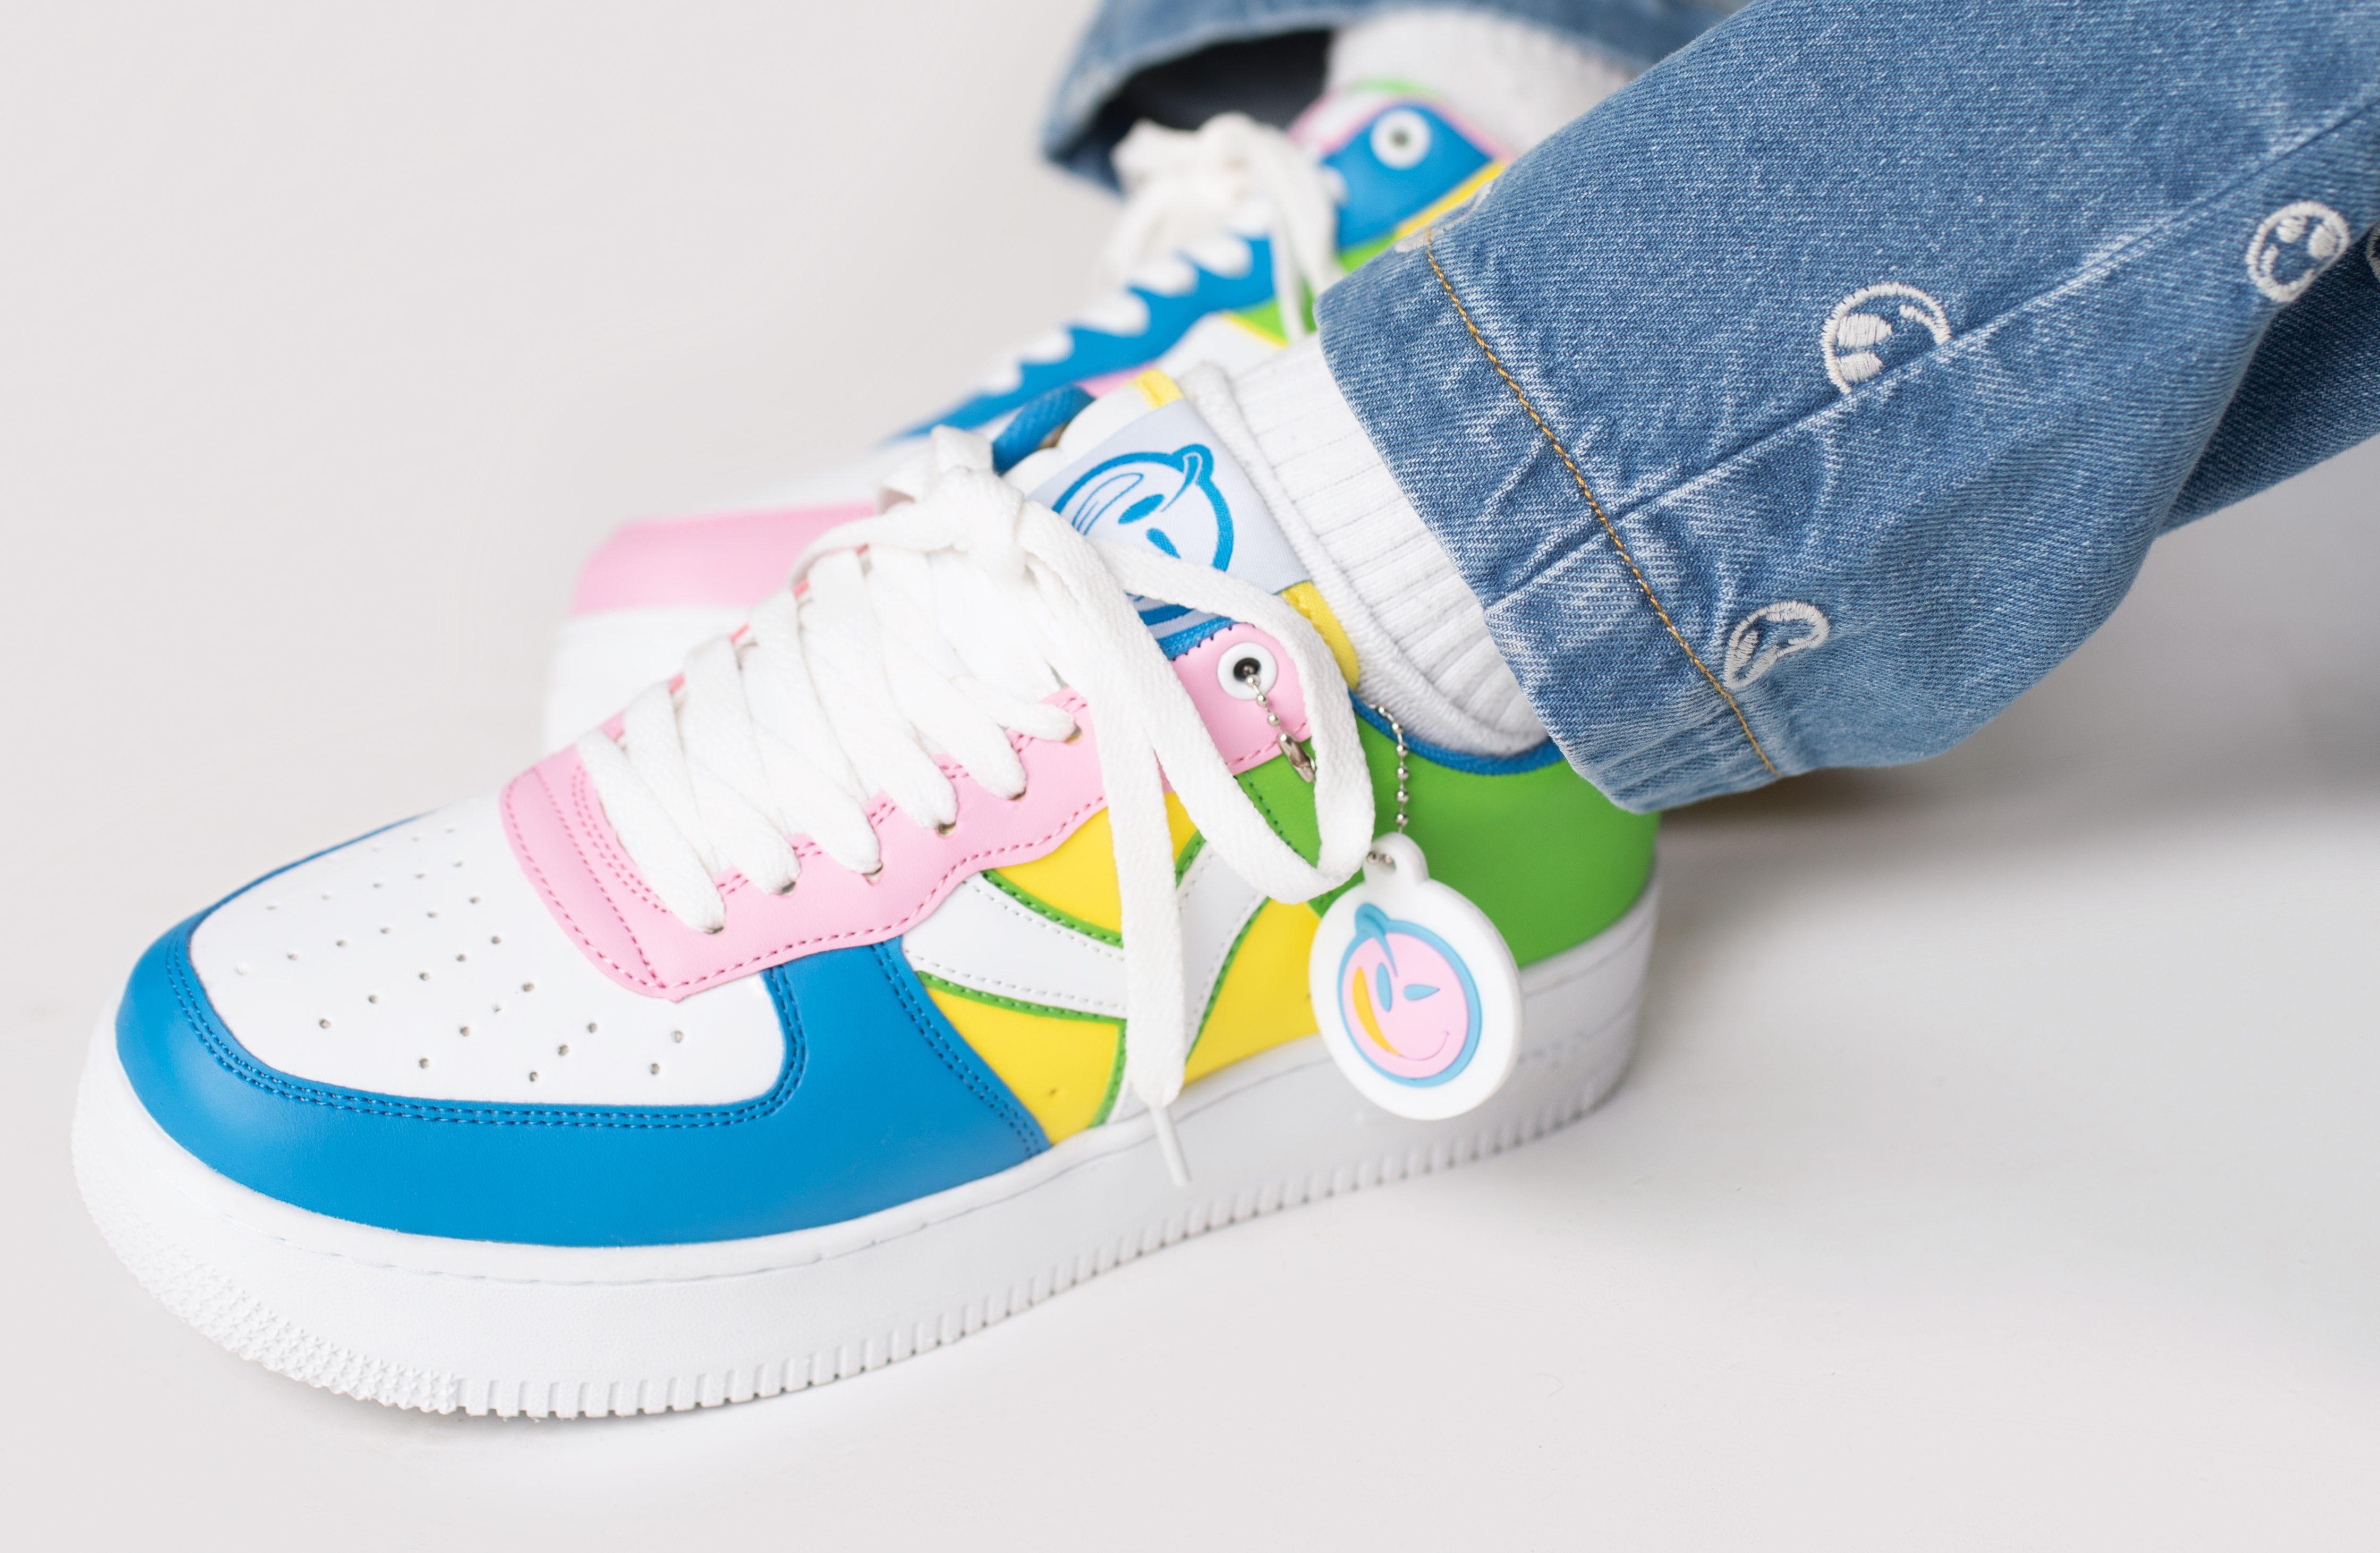 Yums footwear